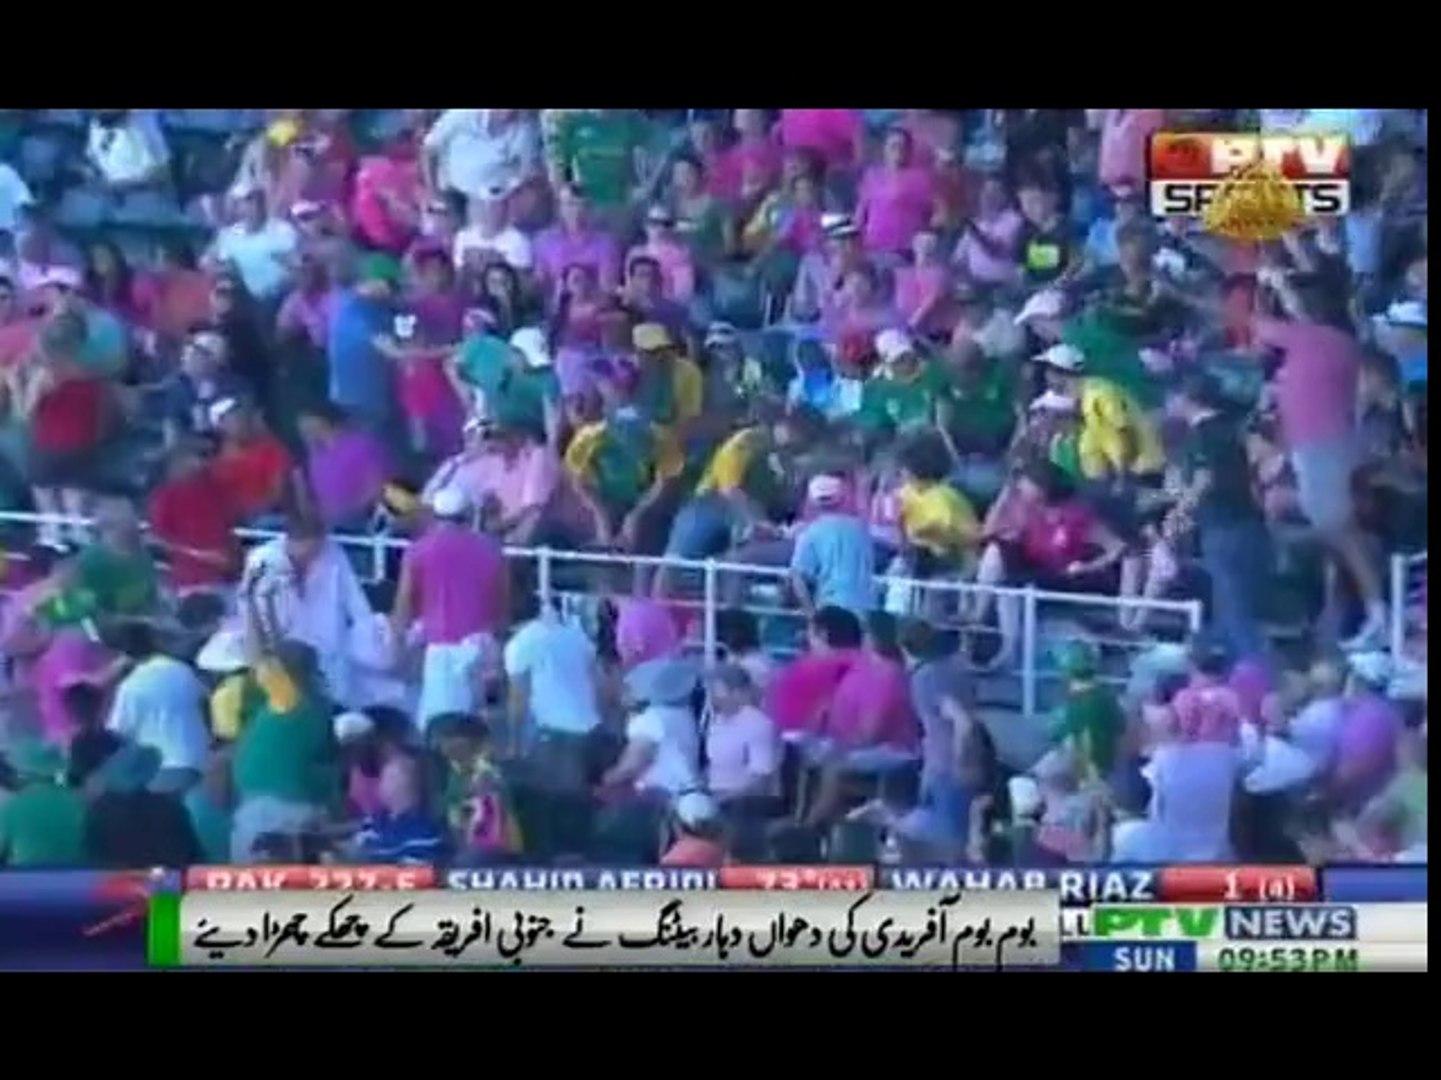 PTV News - Shahid Afridi vs South Africa